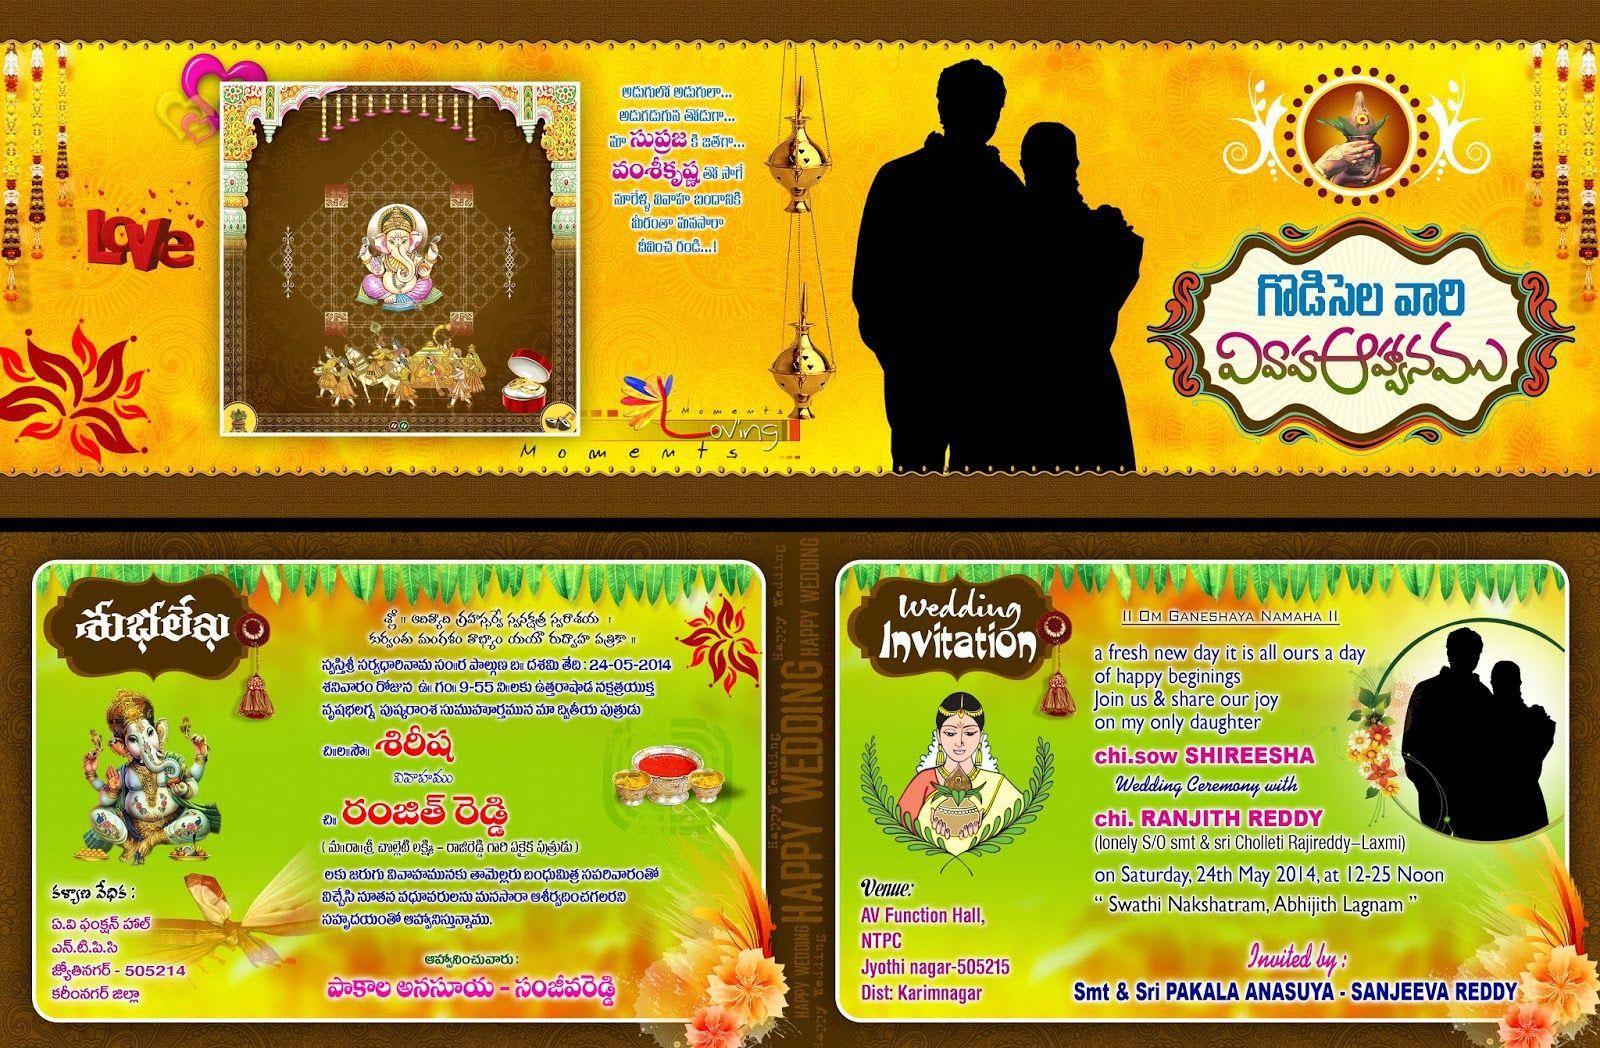 Wedding Invitation Card Psd Templates Free Download